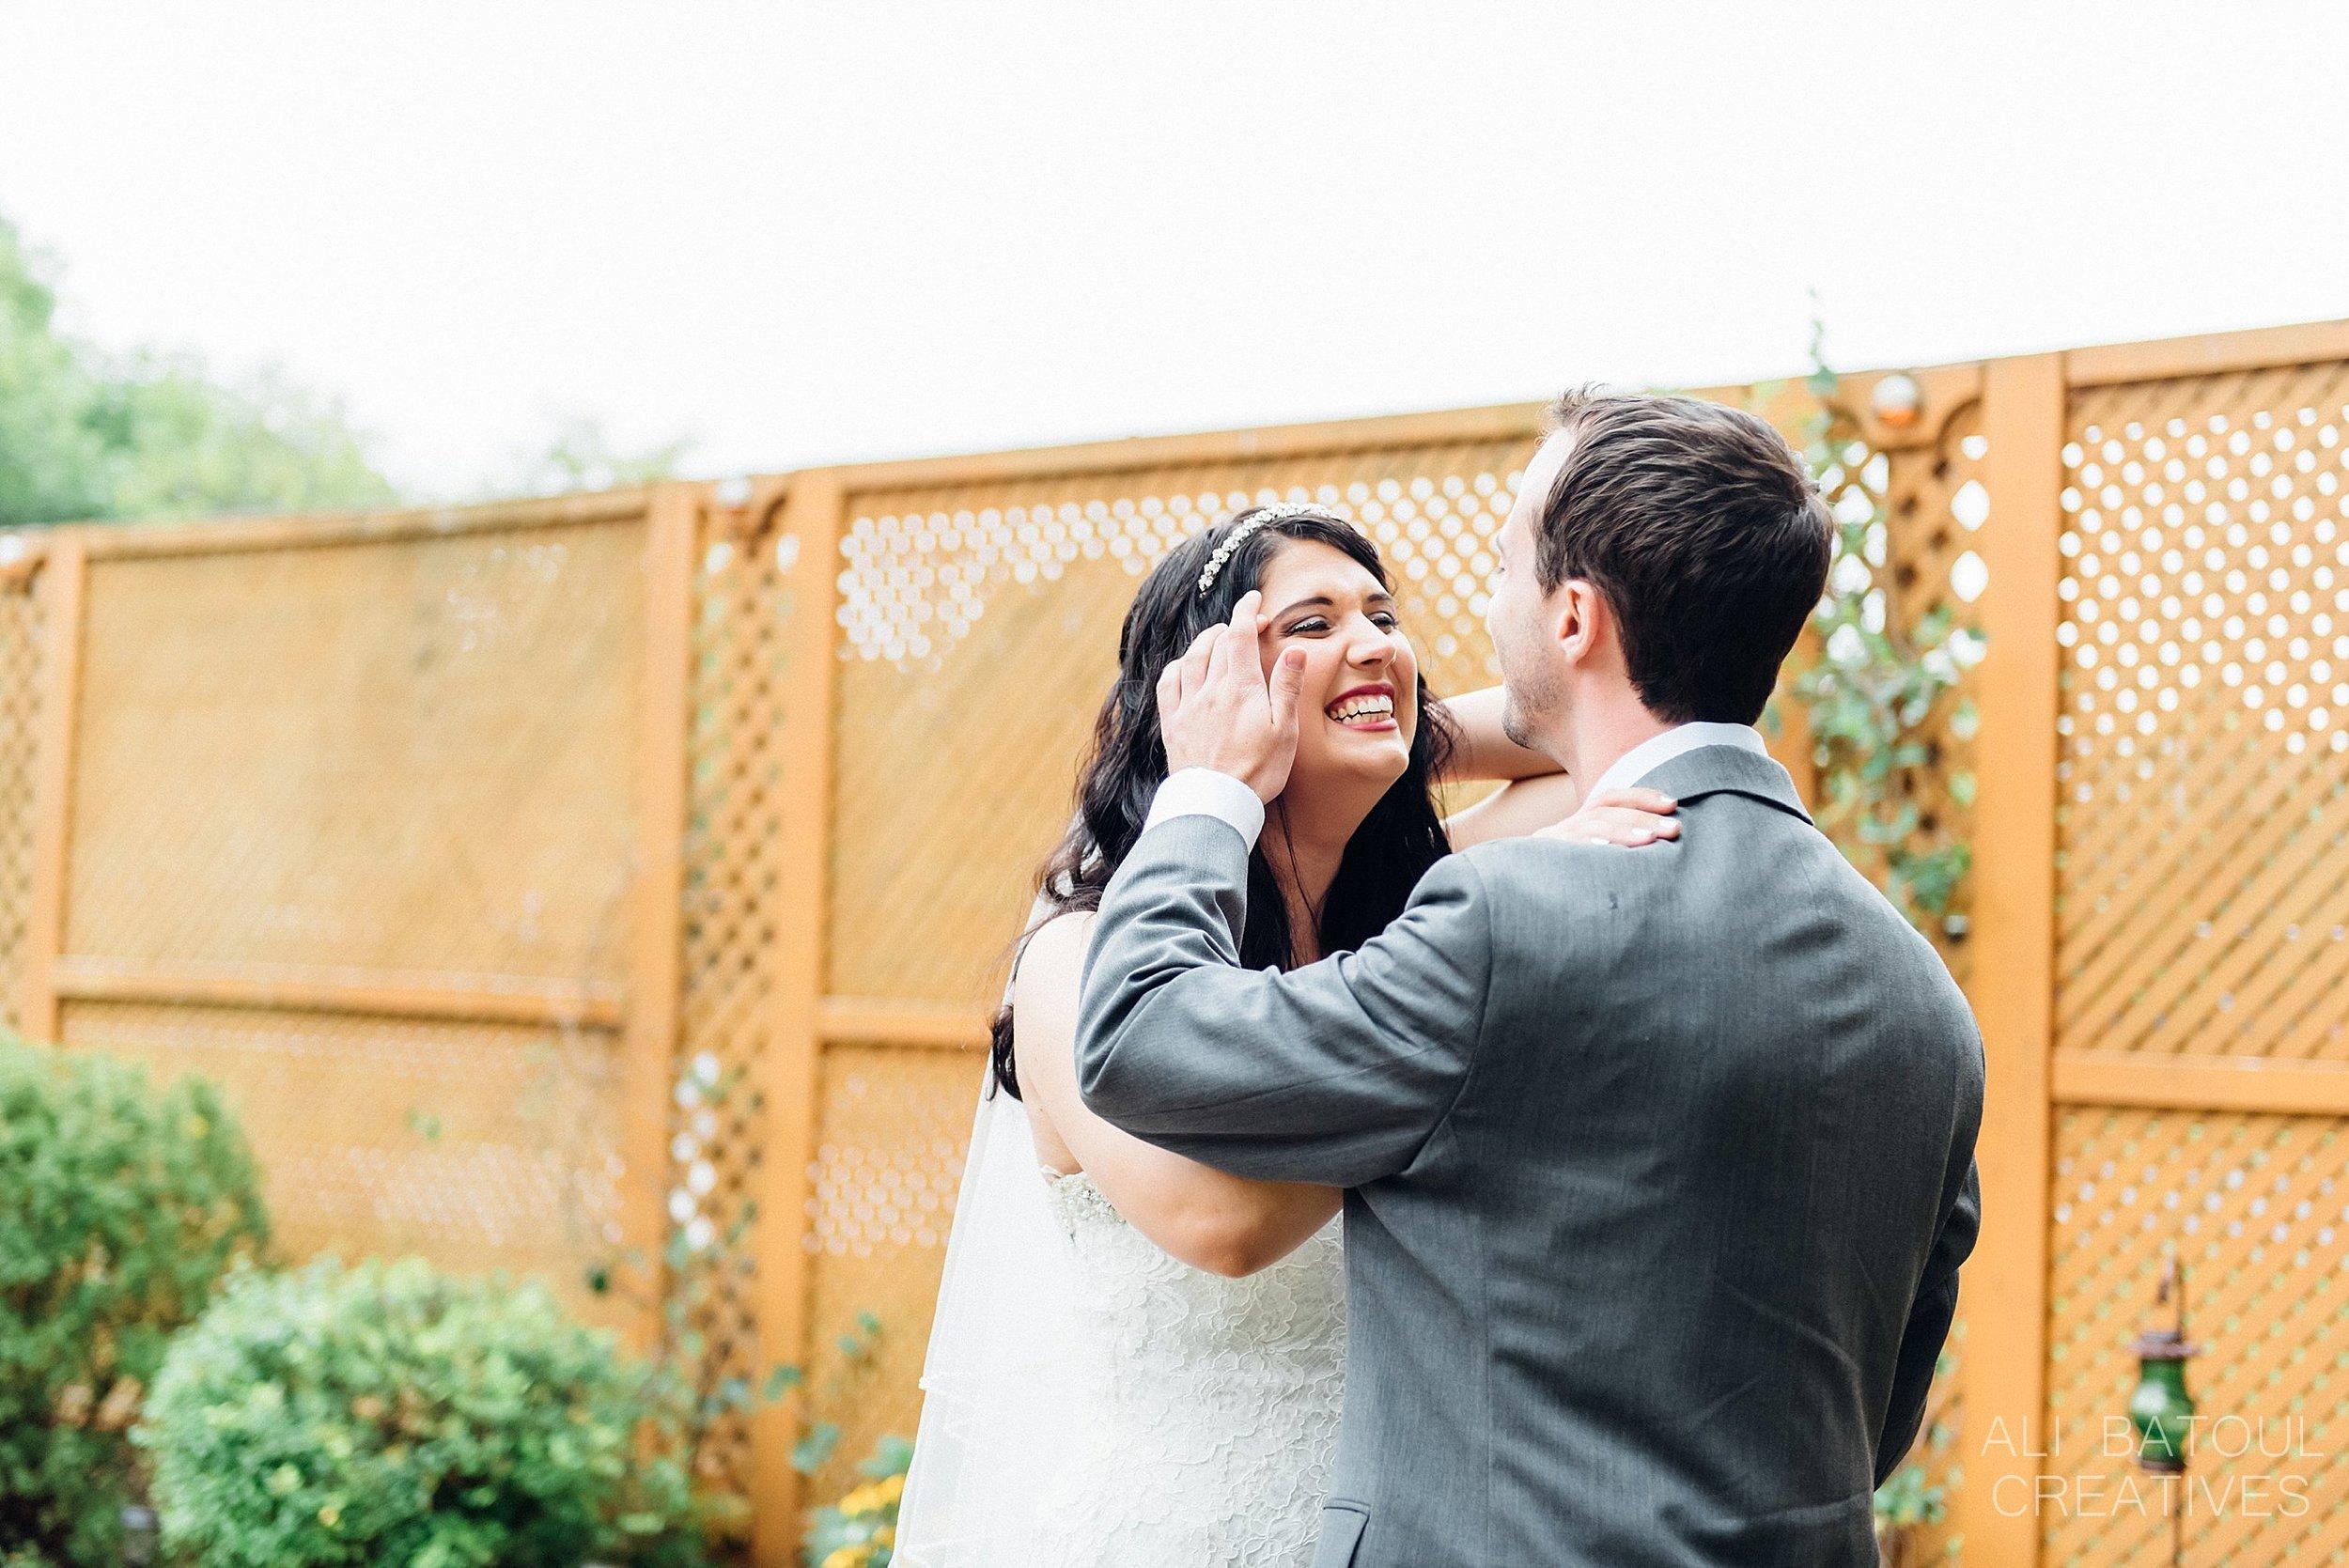 Jocelyn + Steve At The Schoolhouse Wedding - Ali and Batoul Fine Art Wedding Photography_0027.jpg